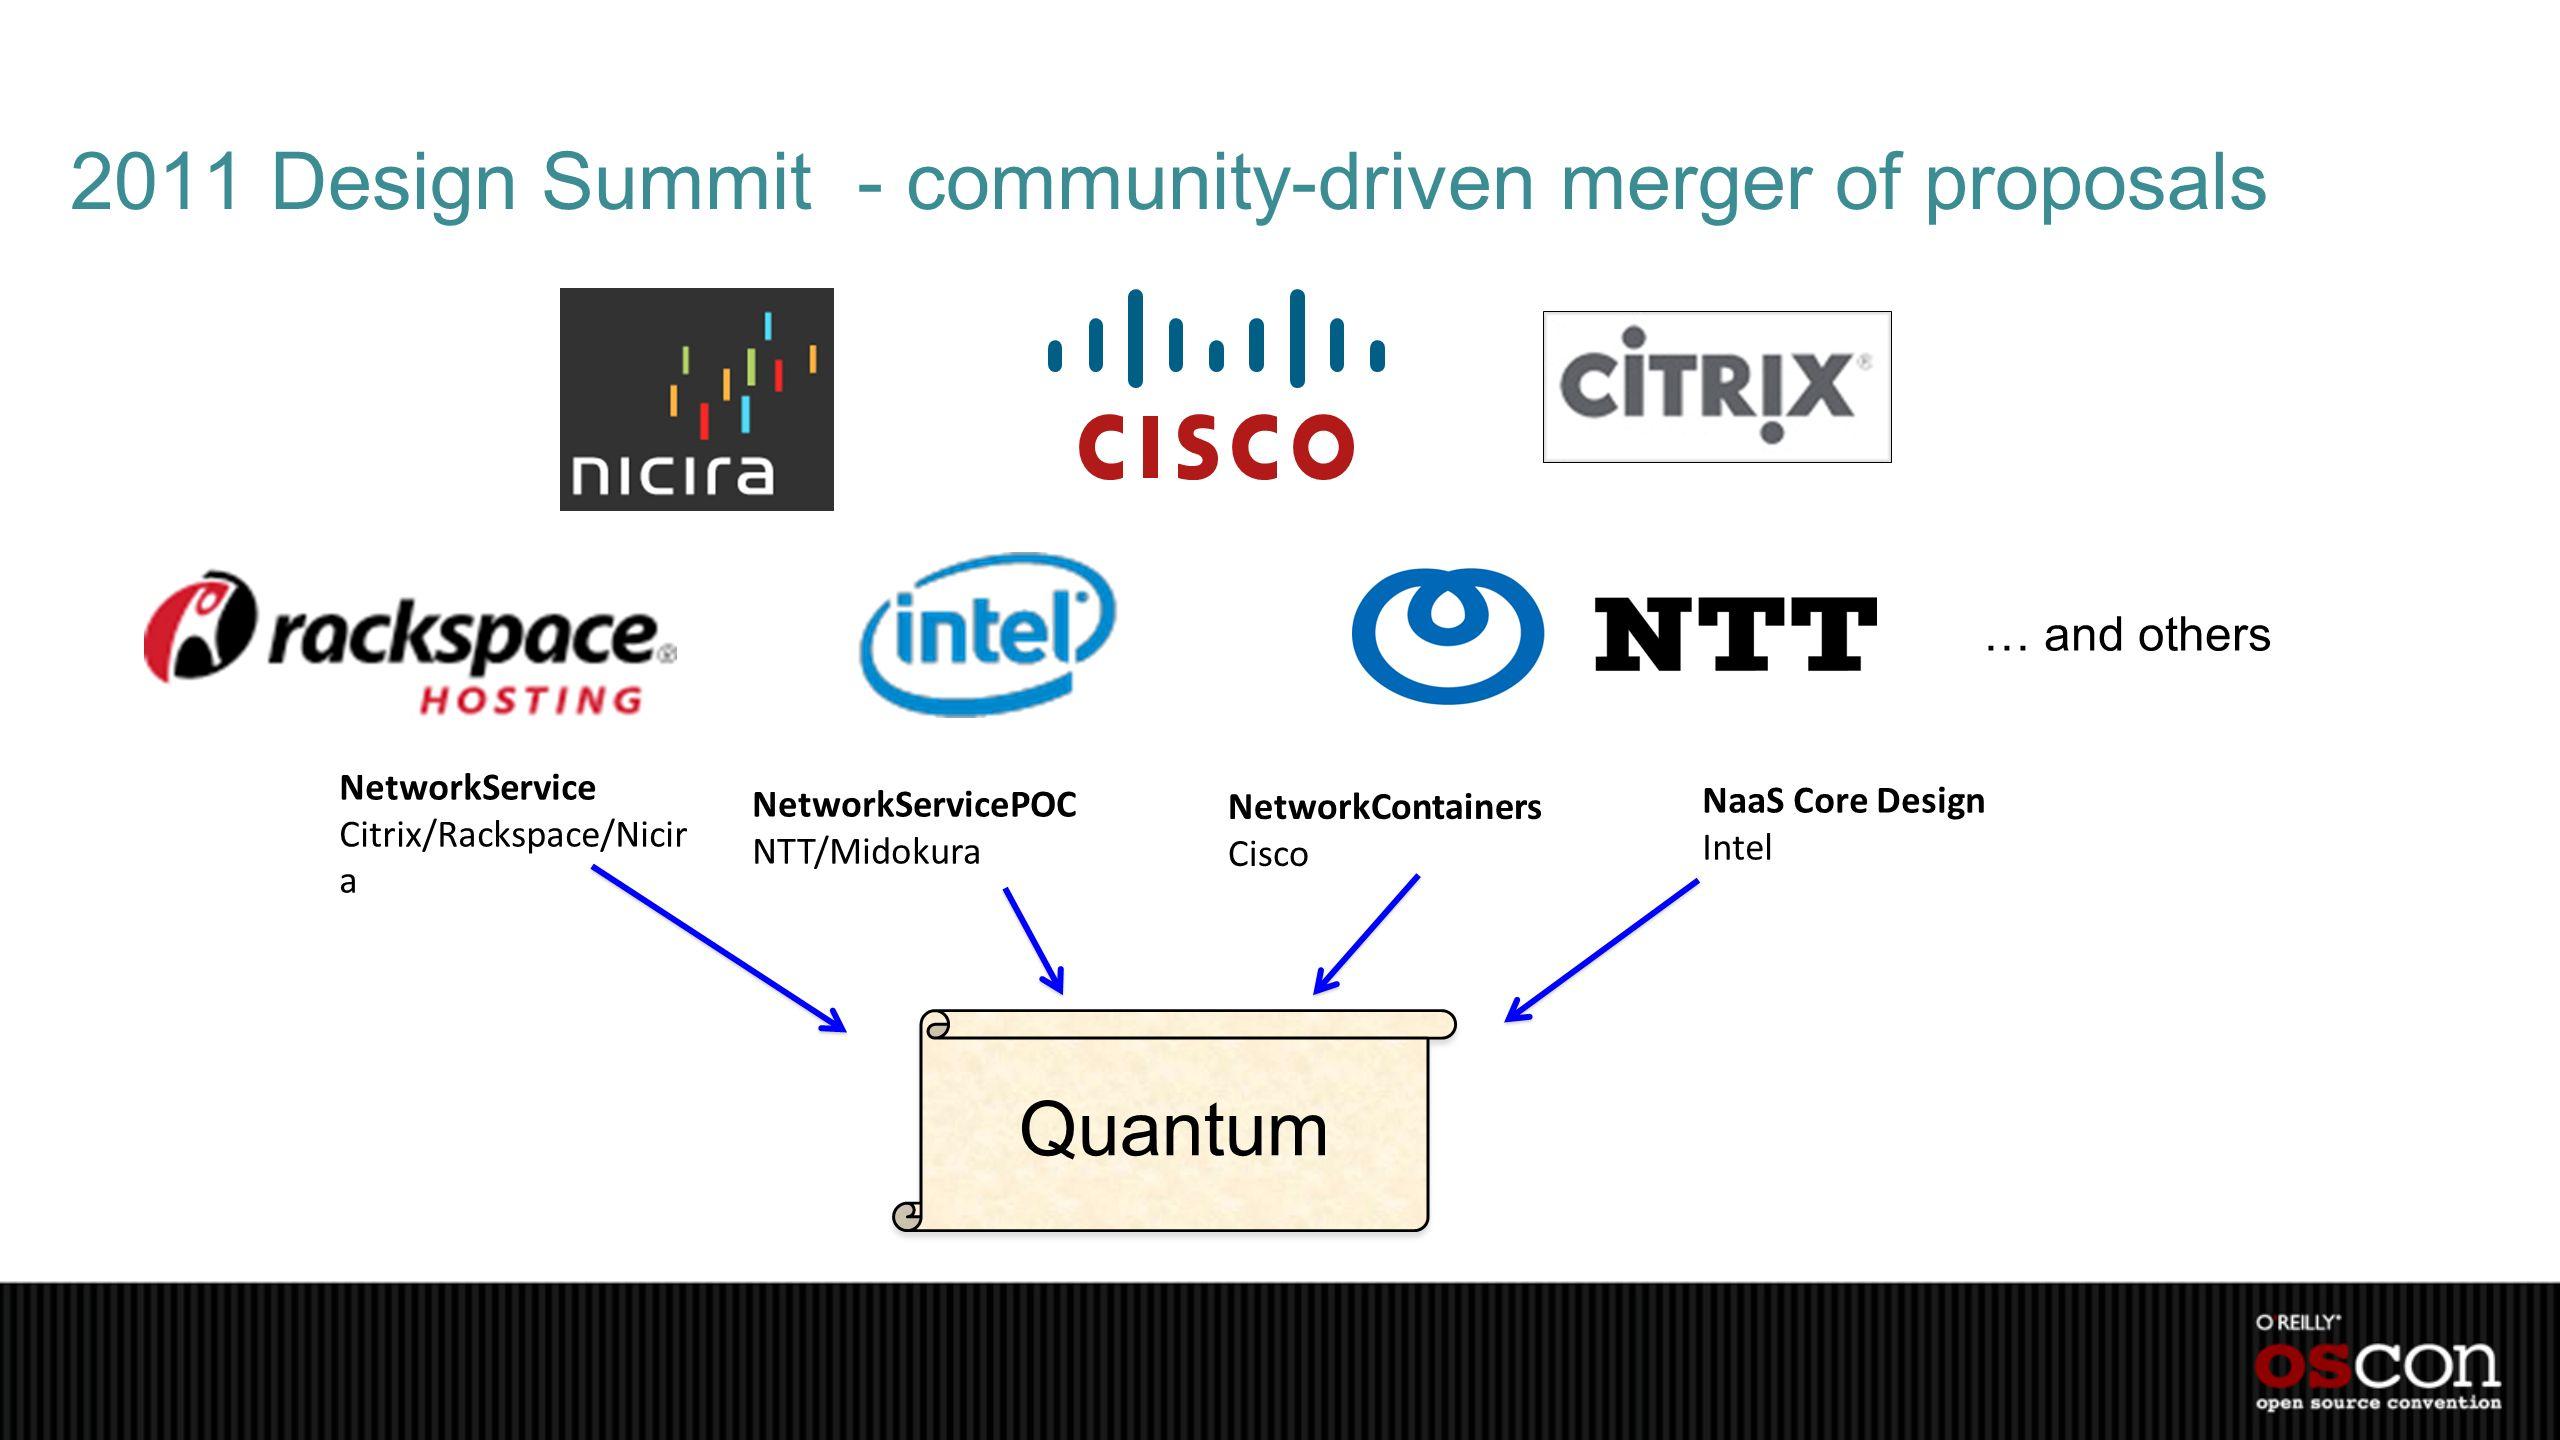 2011 Design Summit - community-driven merger of proposals NetworkServicePOC NTT/Midokura NetworkContainers Cisco NetworkService Citrix/Rackspace/Nicir